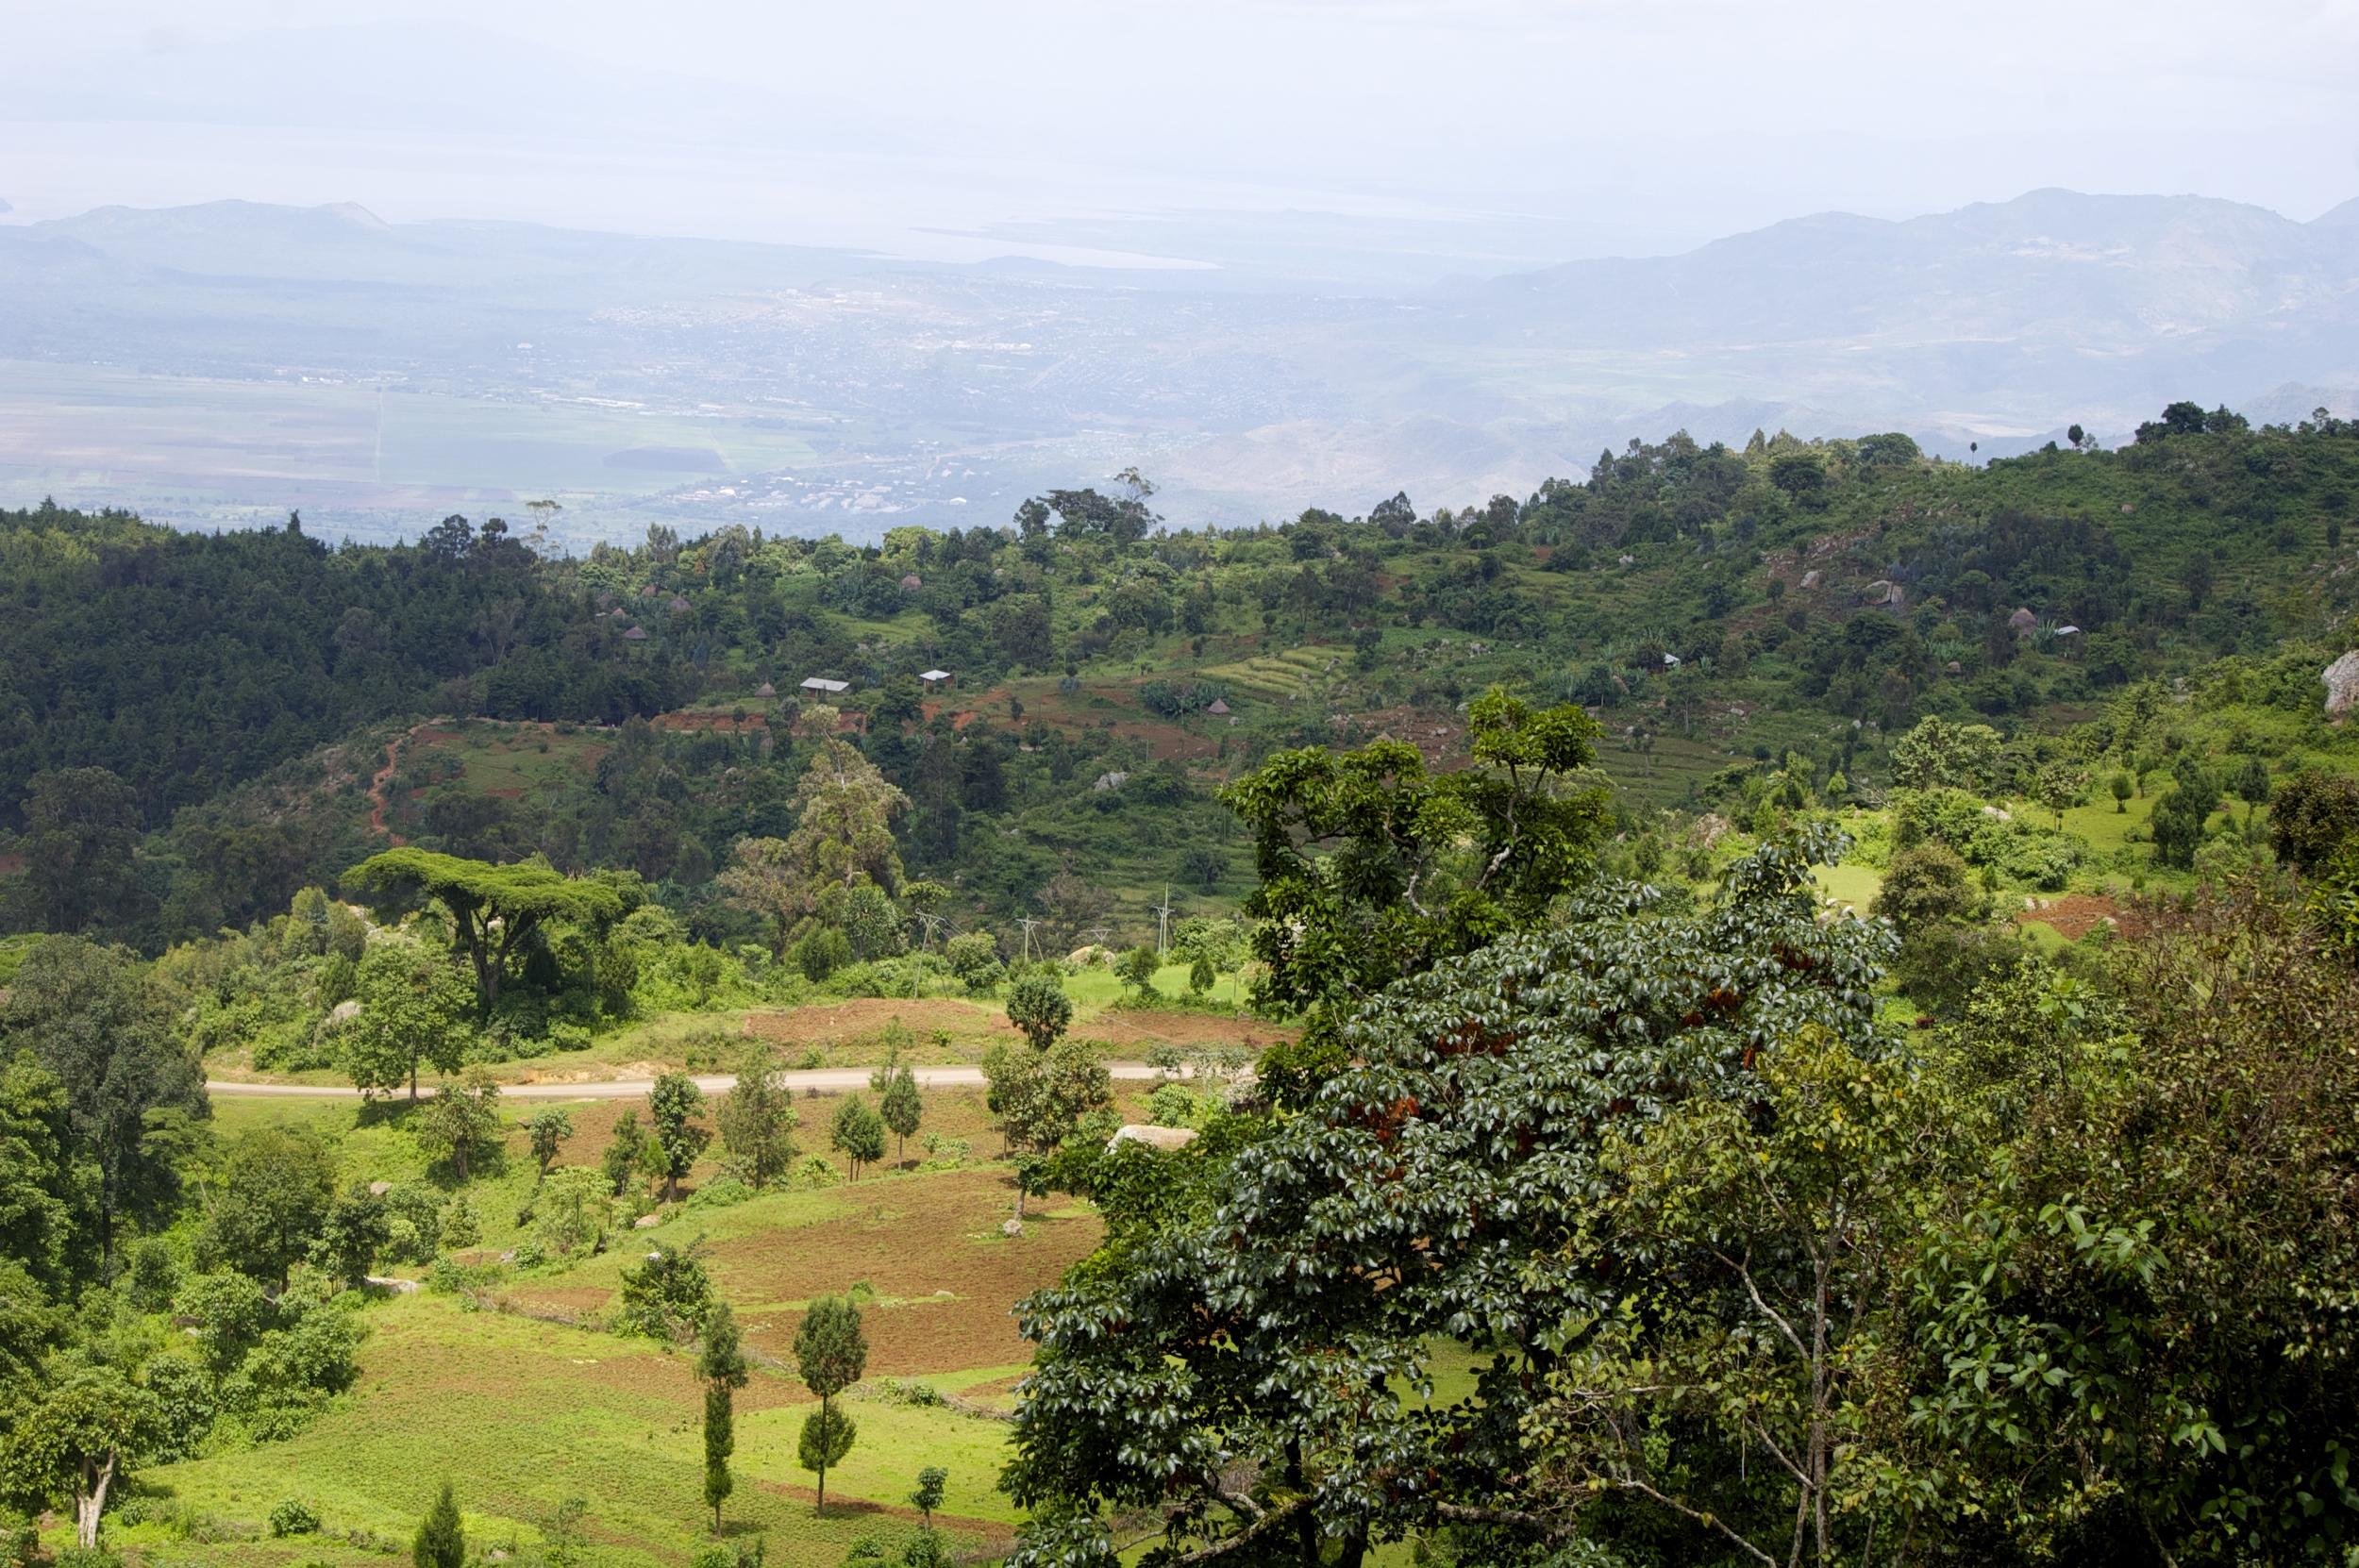 the Omo Valley